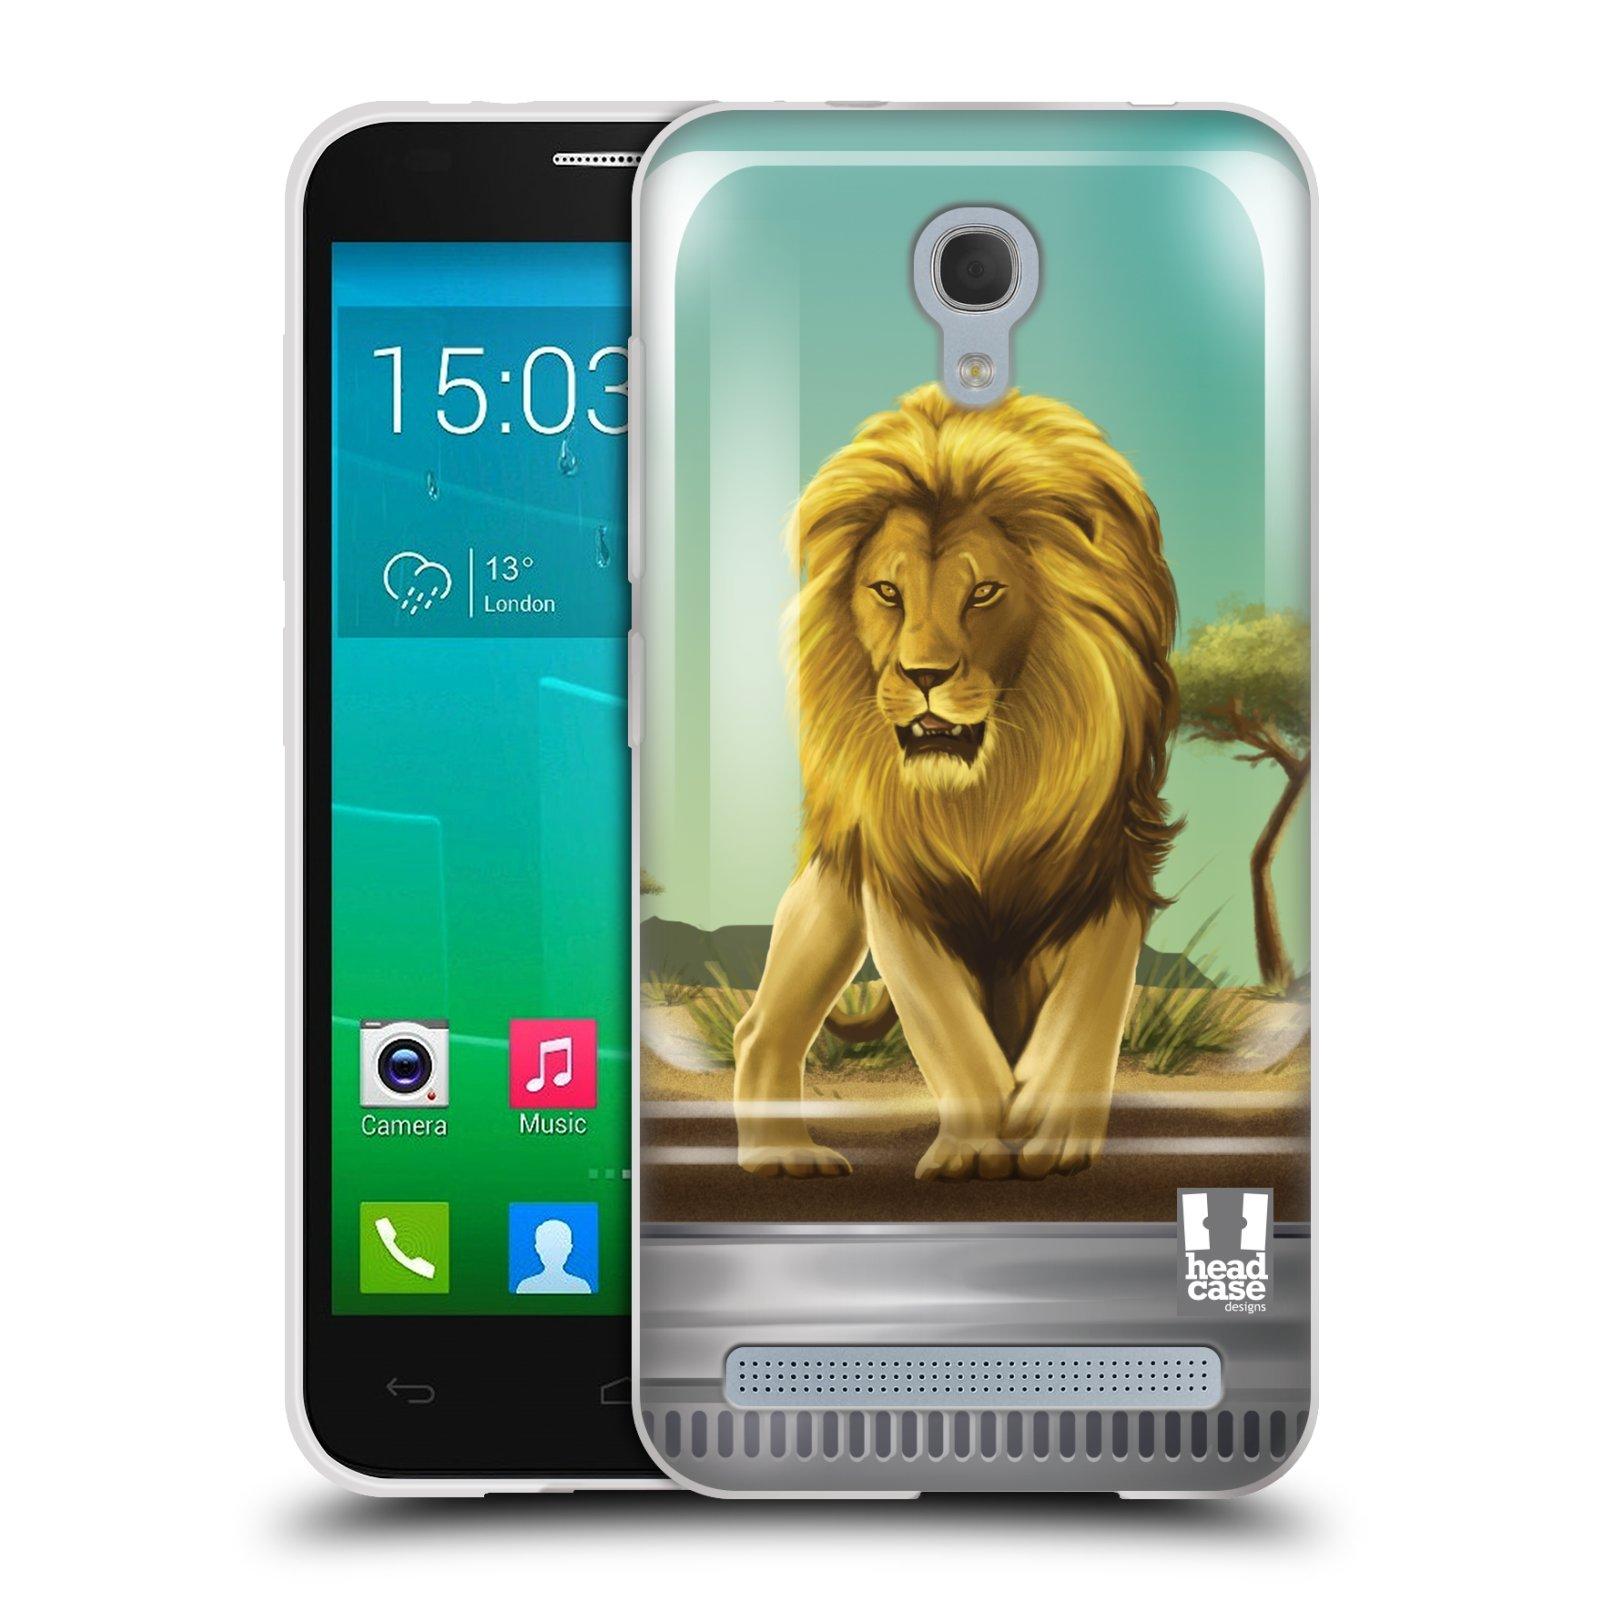 HEAD CASE silikonový obal na mobil Alcatel Idol 2 MINI S 6036Y vzor Zvířátka v těžítku lev